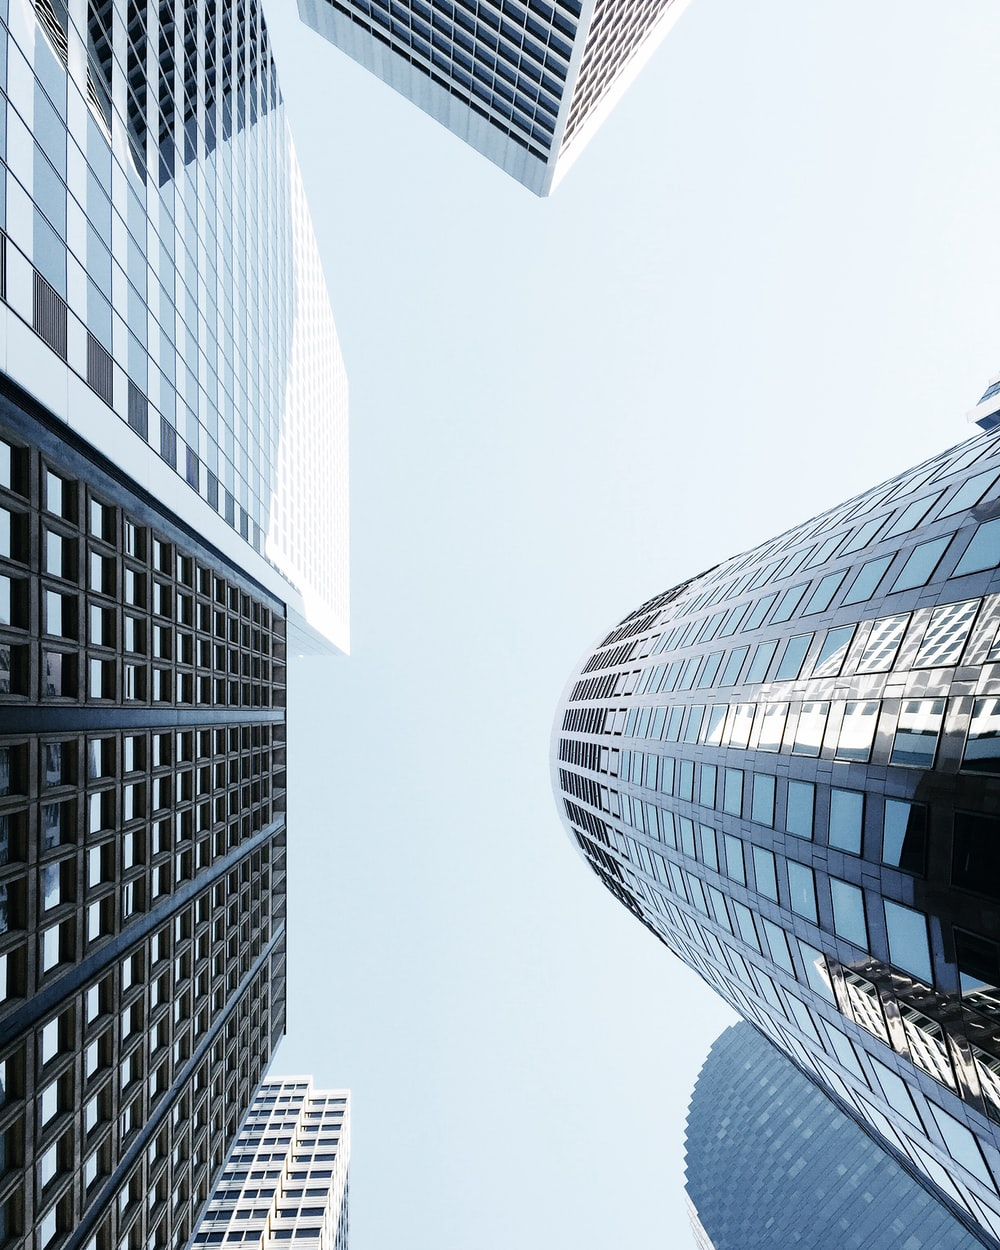 worms eye view of skyscraper